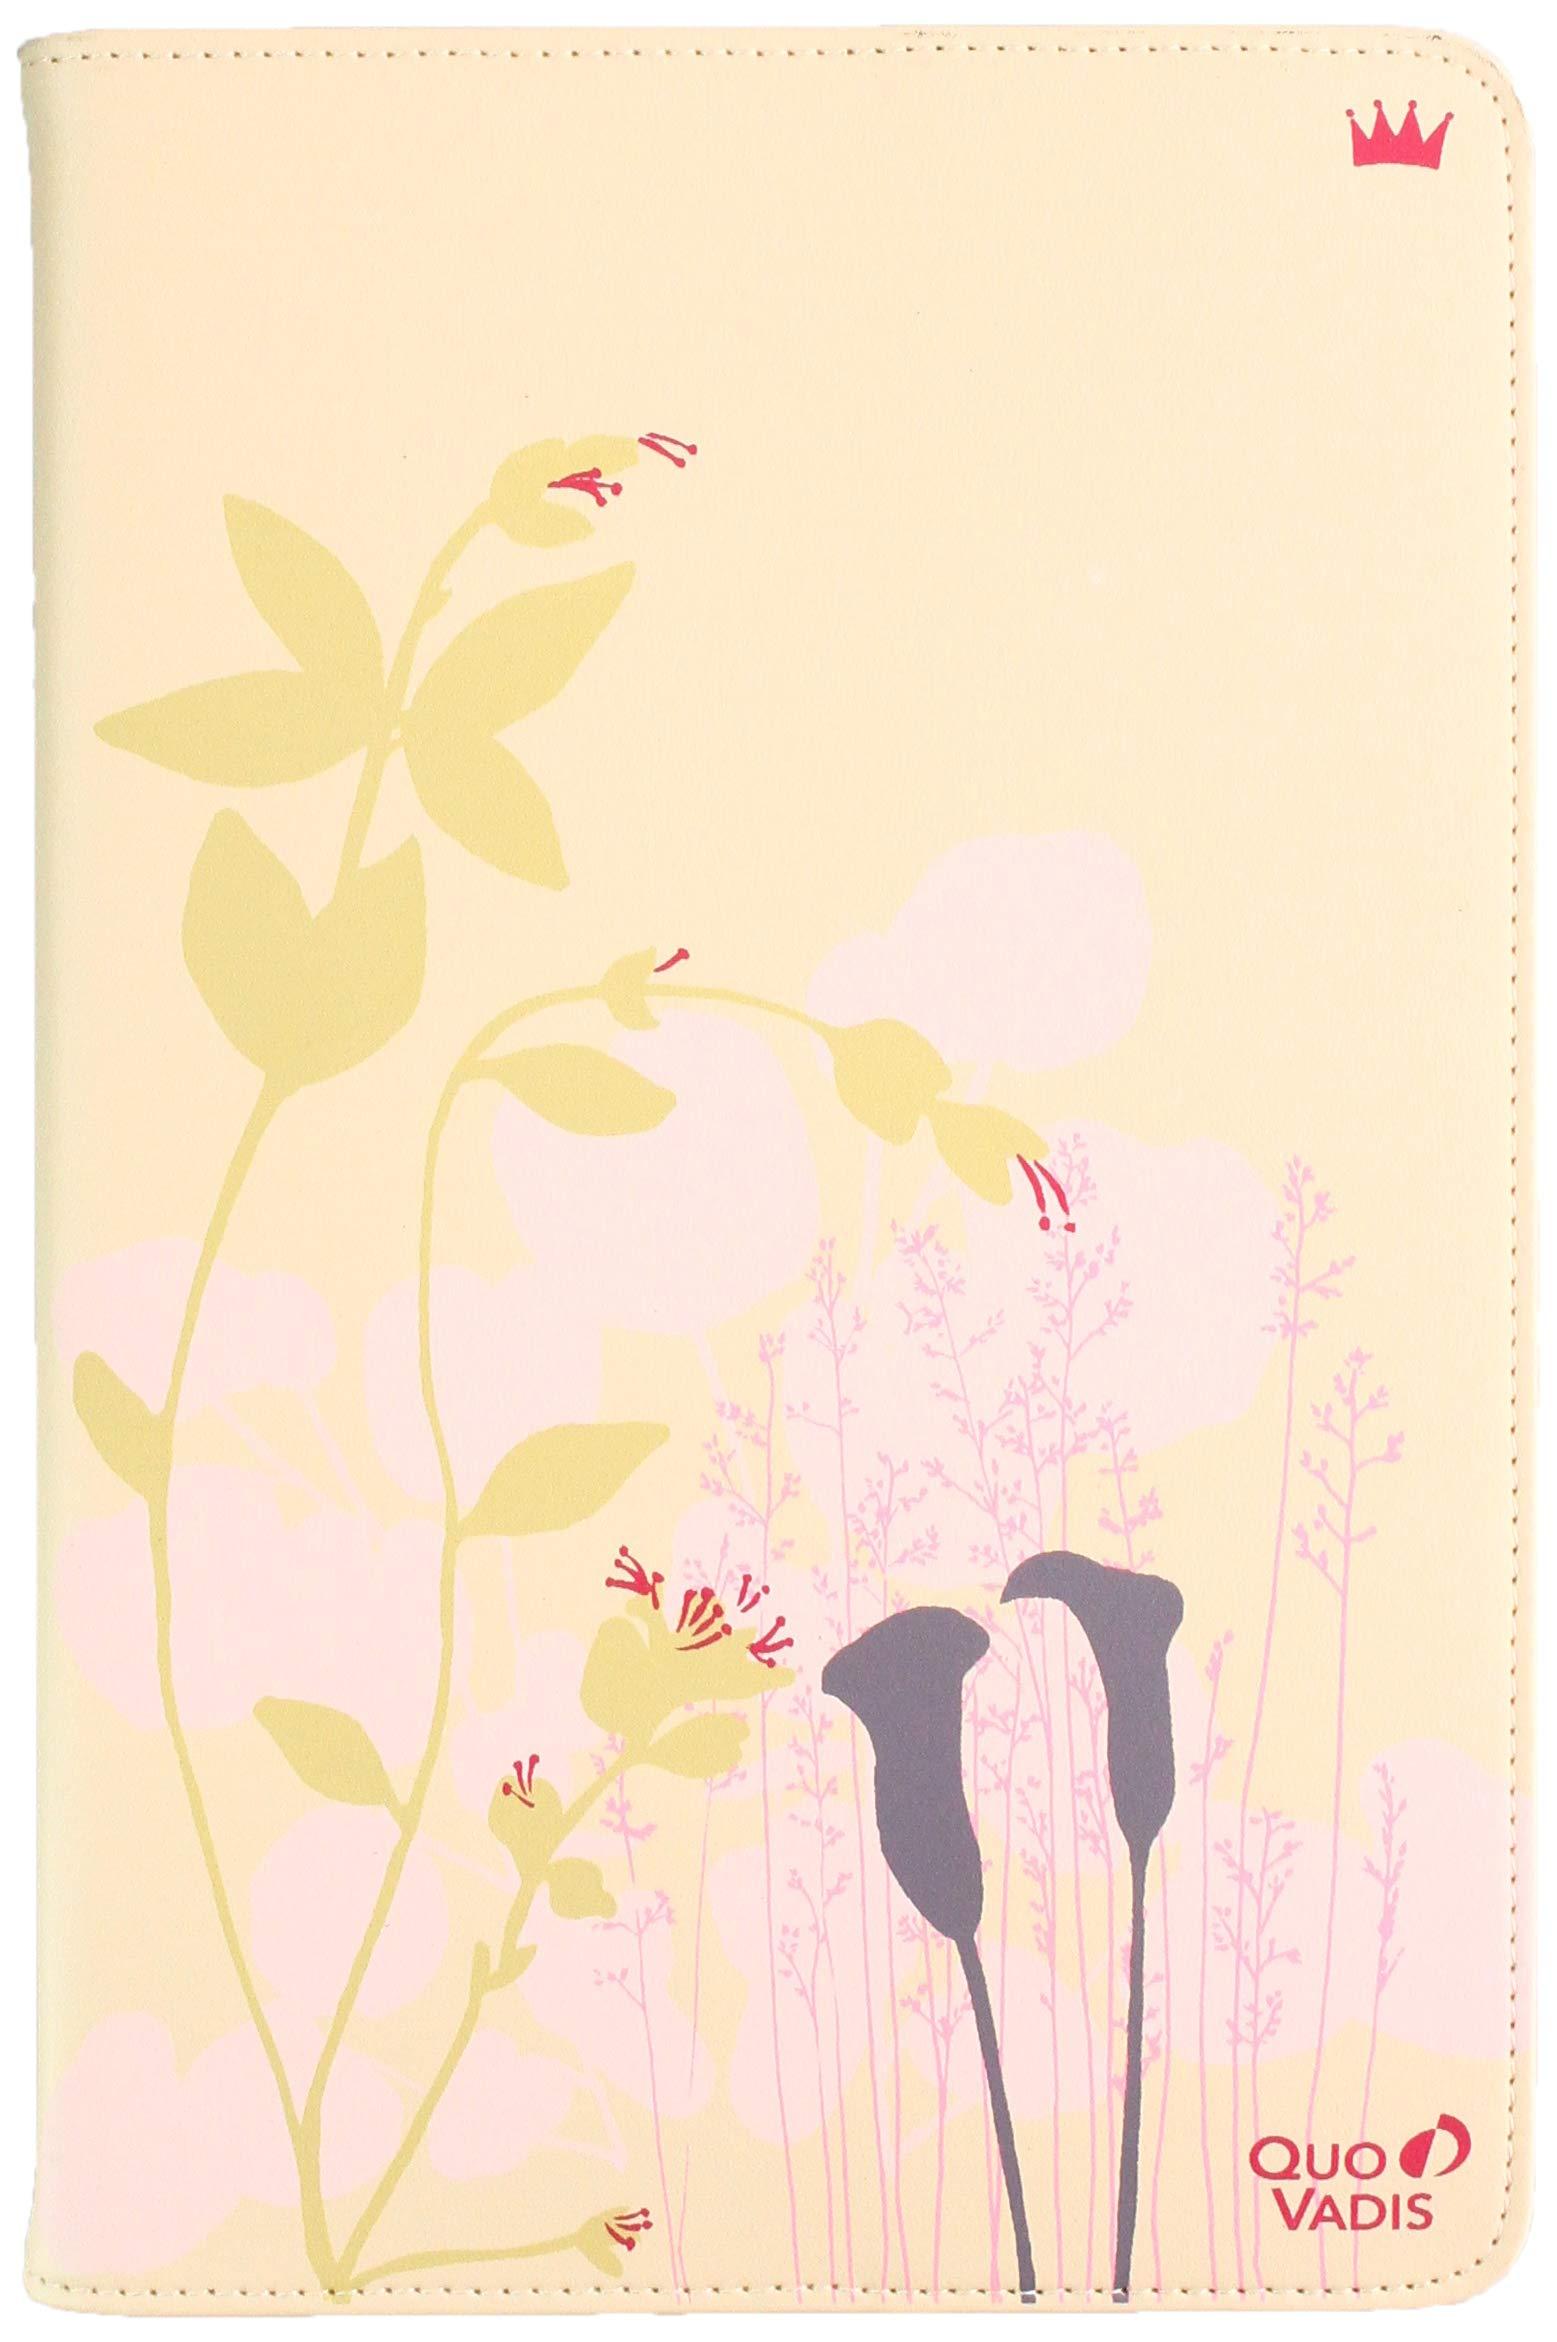 Quo Vadis Robert Le Heros Academic Diary 16 x 24 cm Powder Pink Year 2020 by QUO VADIS